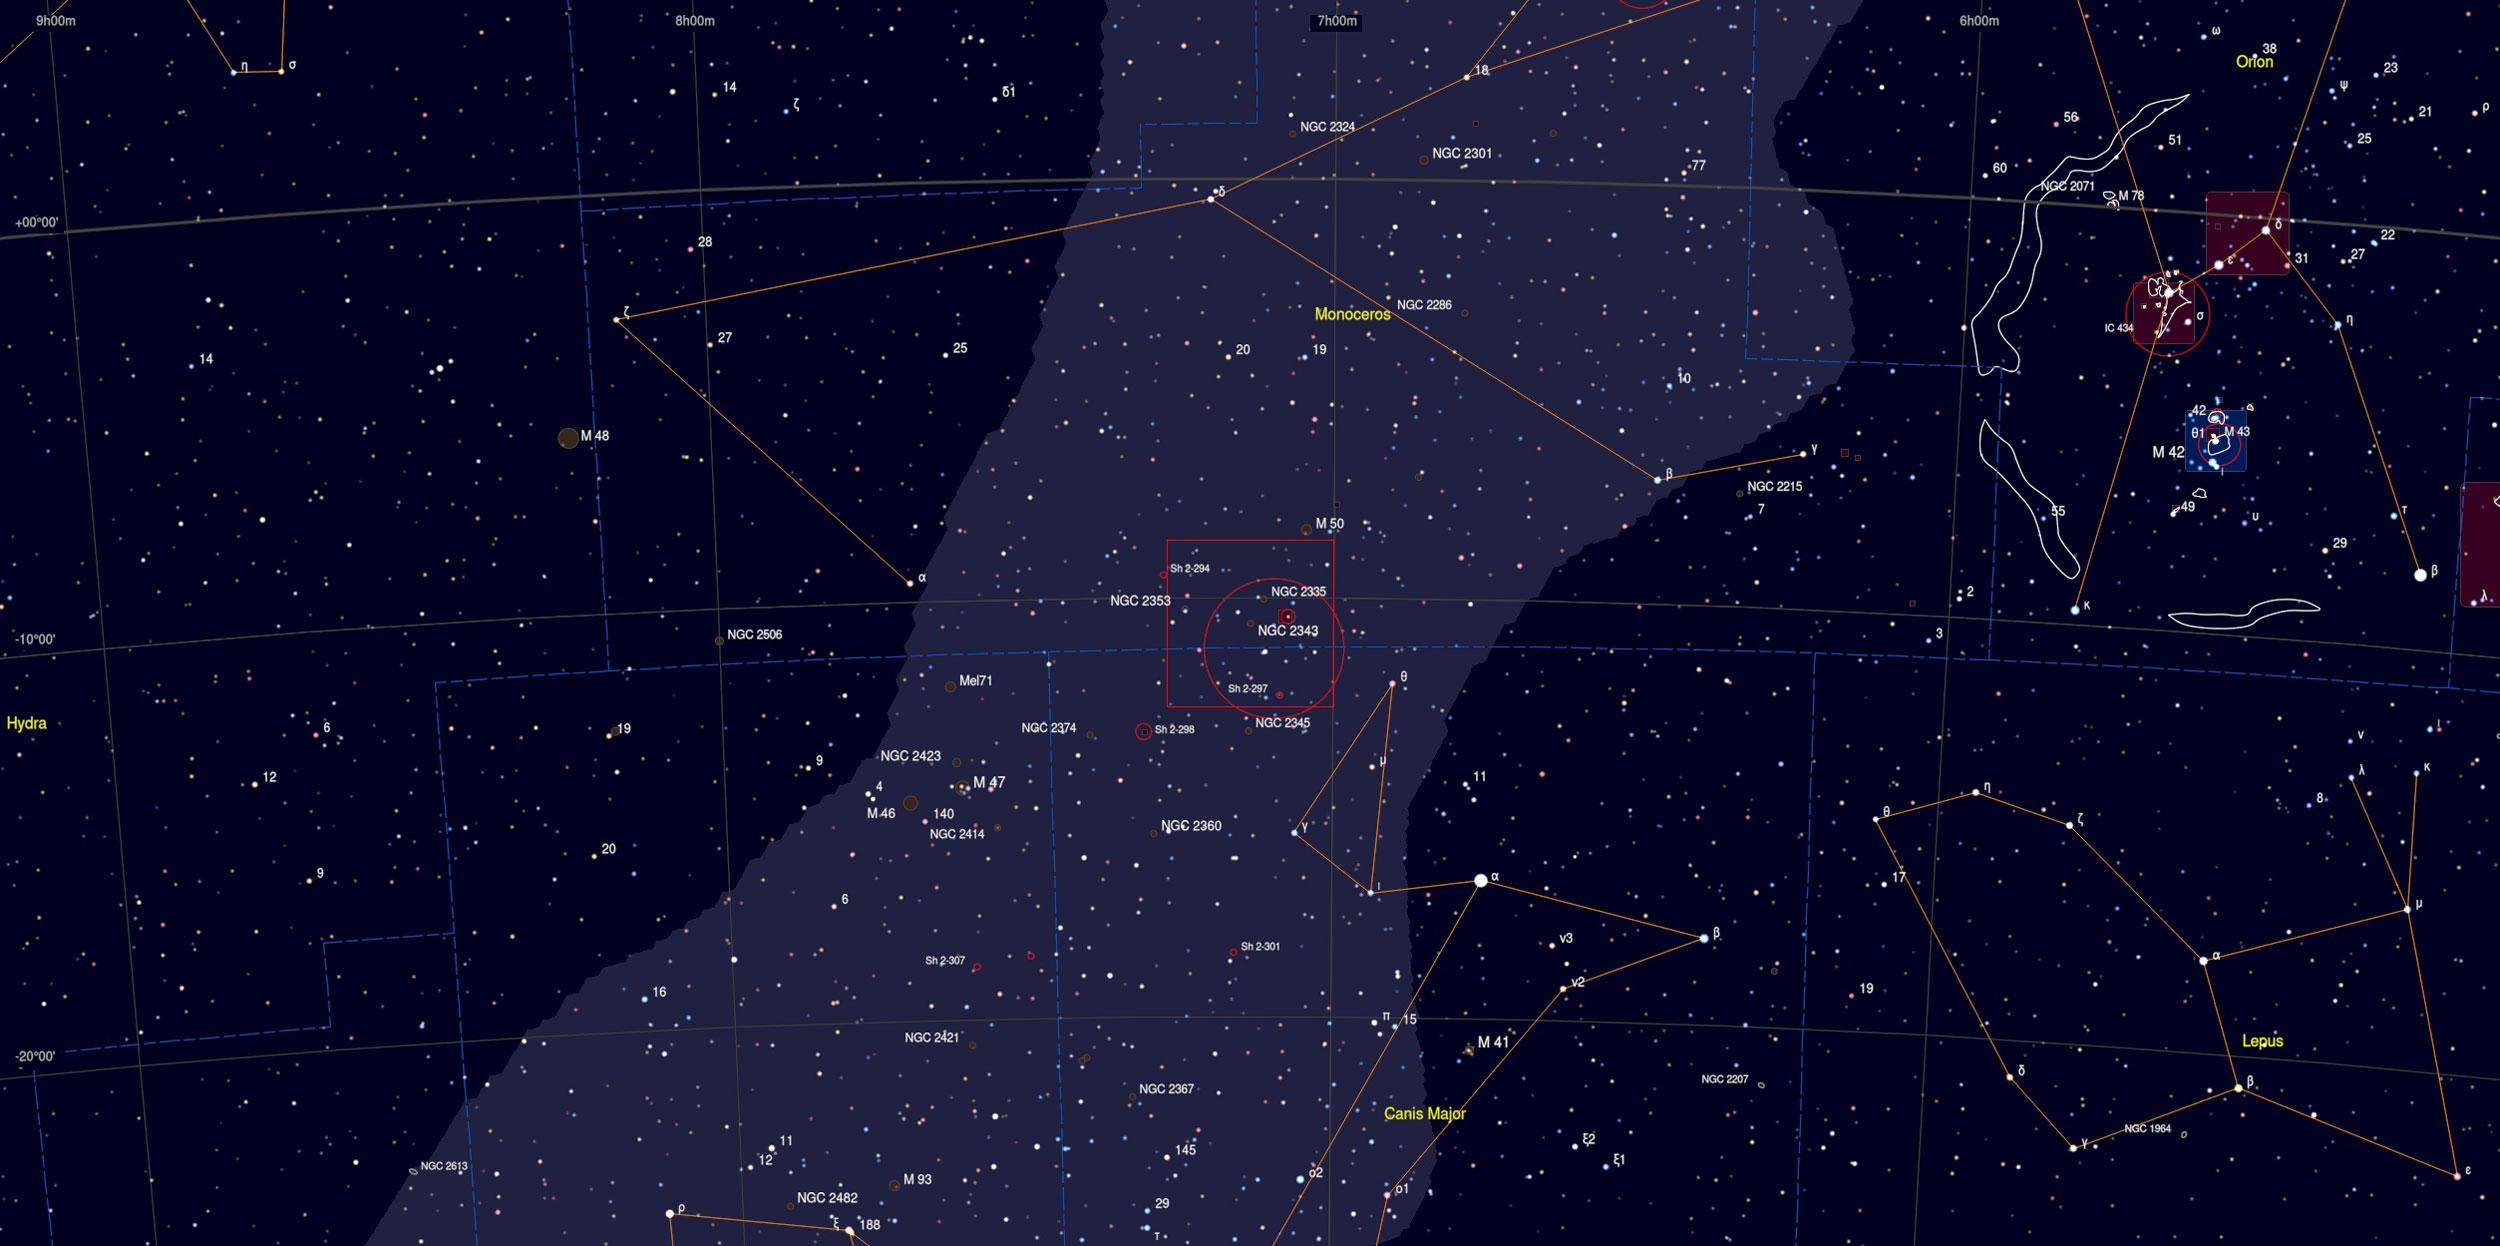 NGC 2343 Nebula Sky Chart - Astrophotography Martin Rusterholz